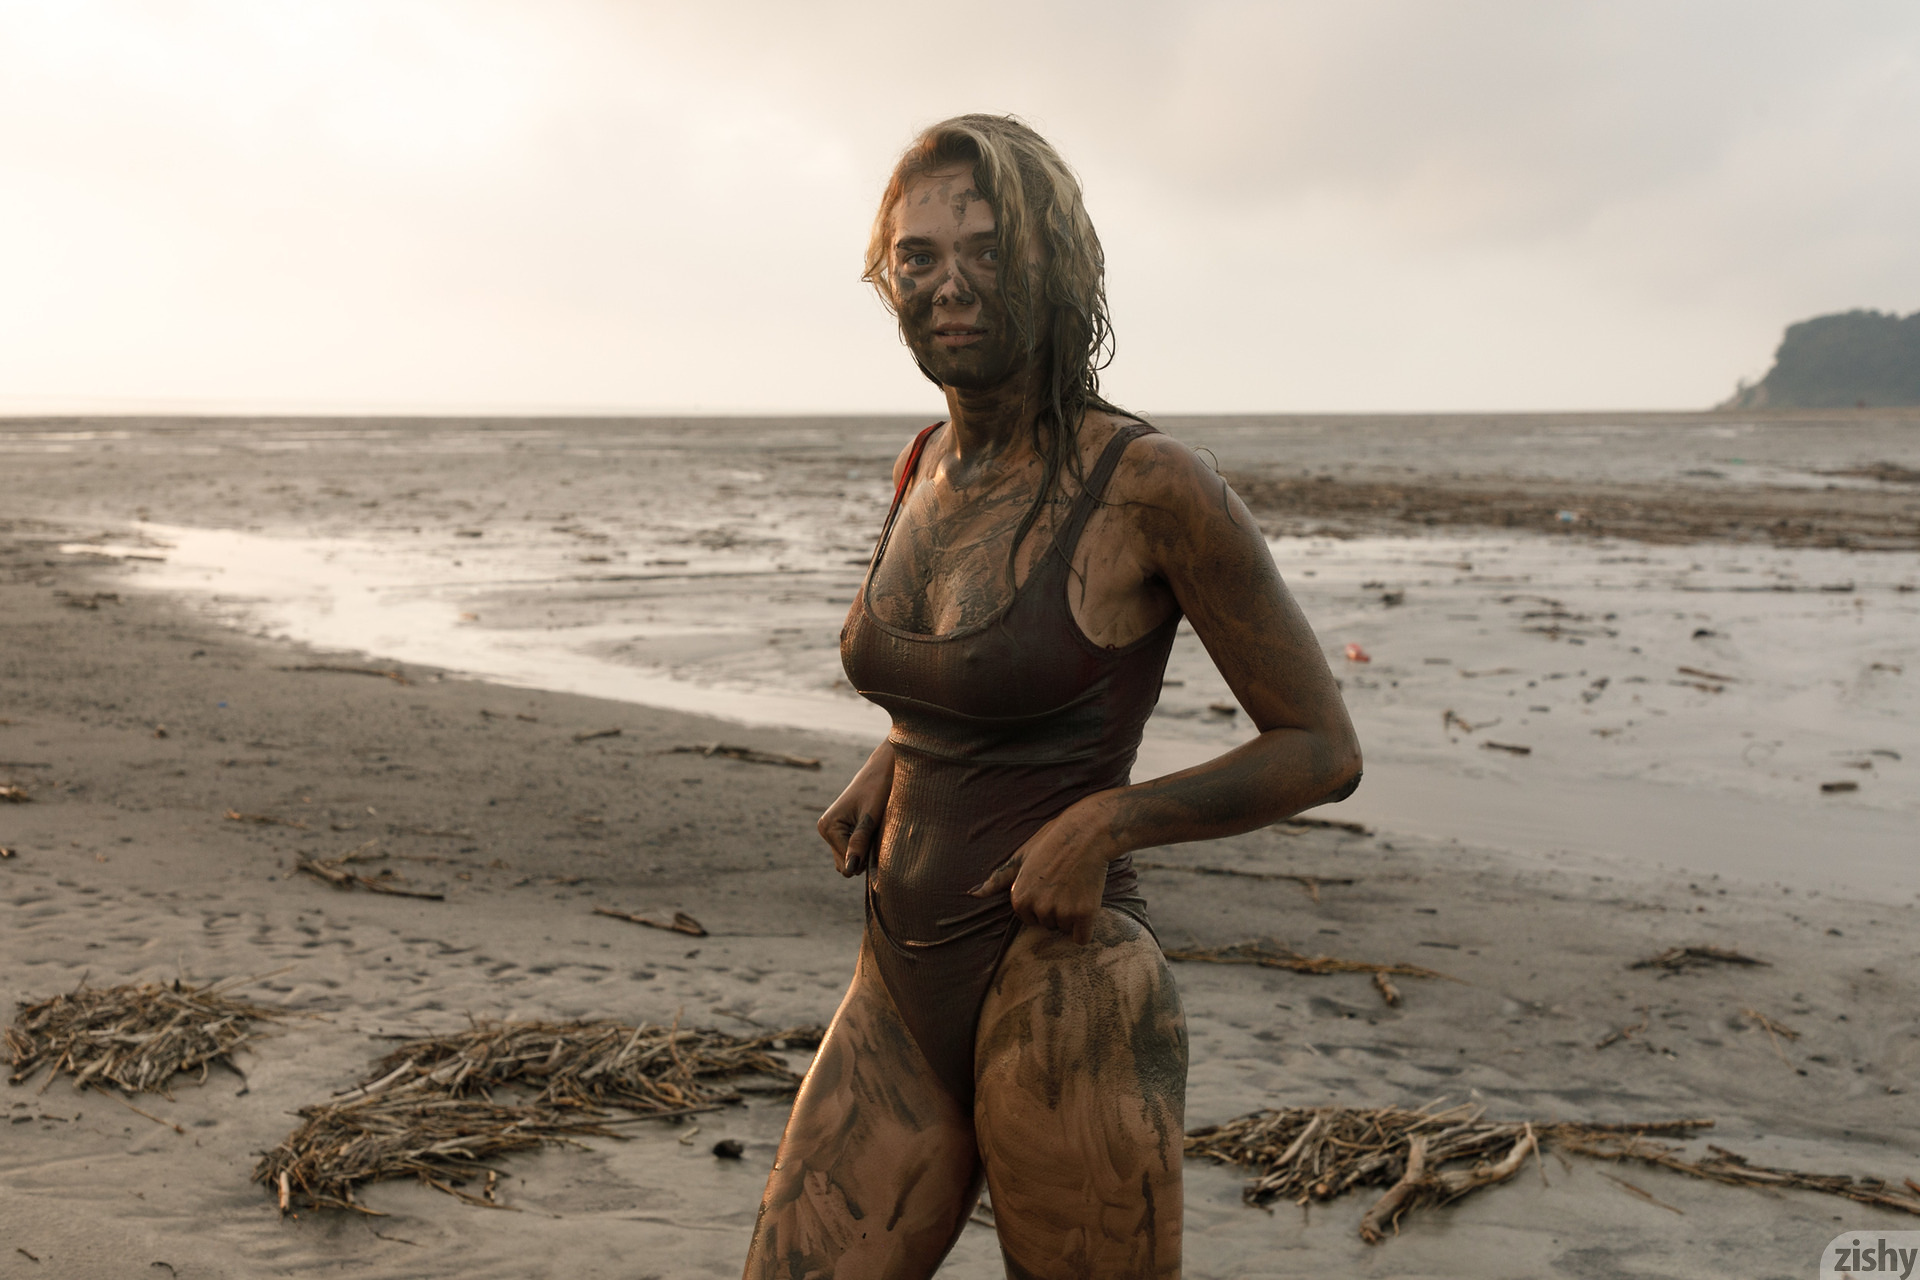 Sofia Orlova On Gryaznyy Beach Zishy (61)